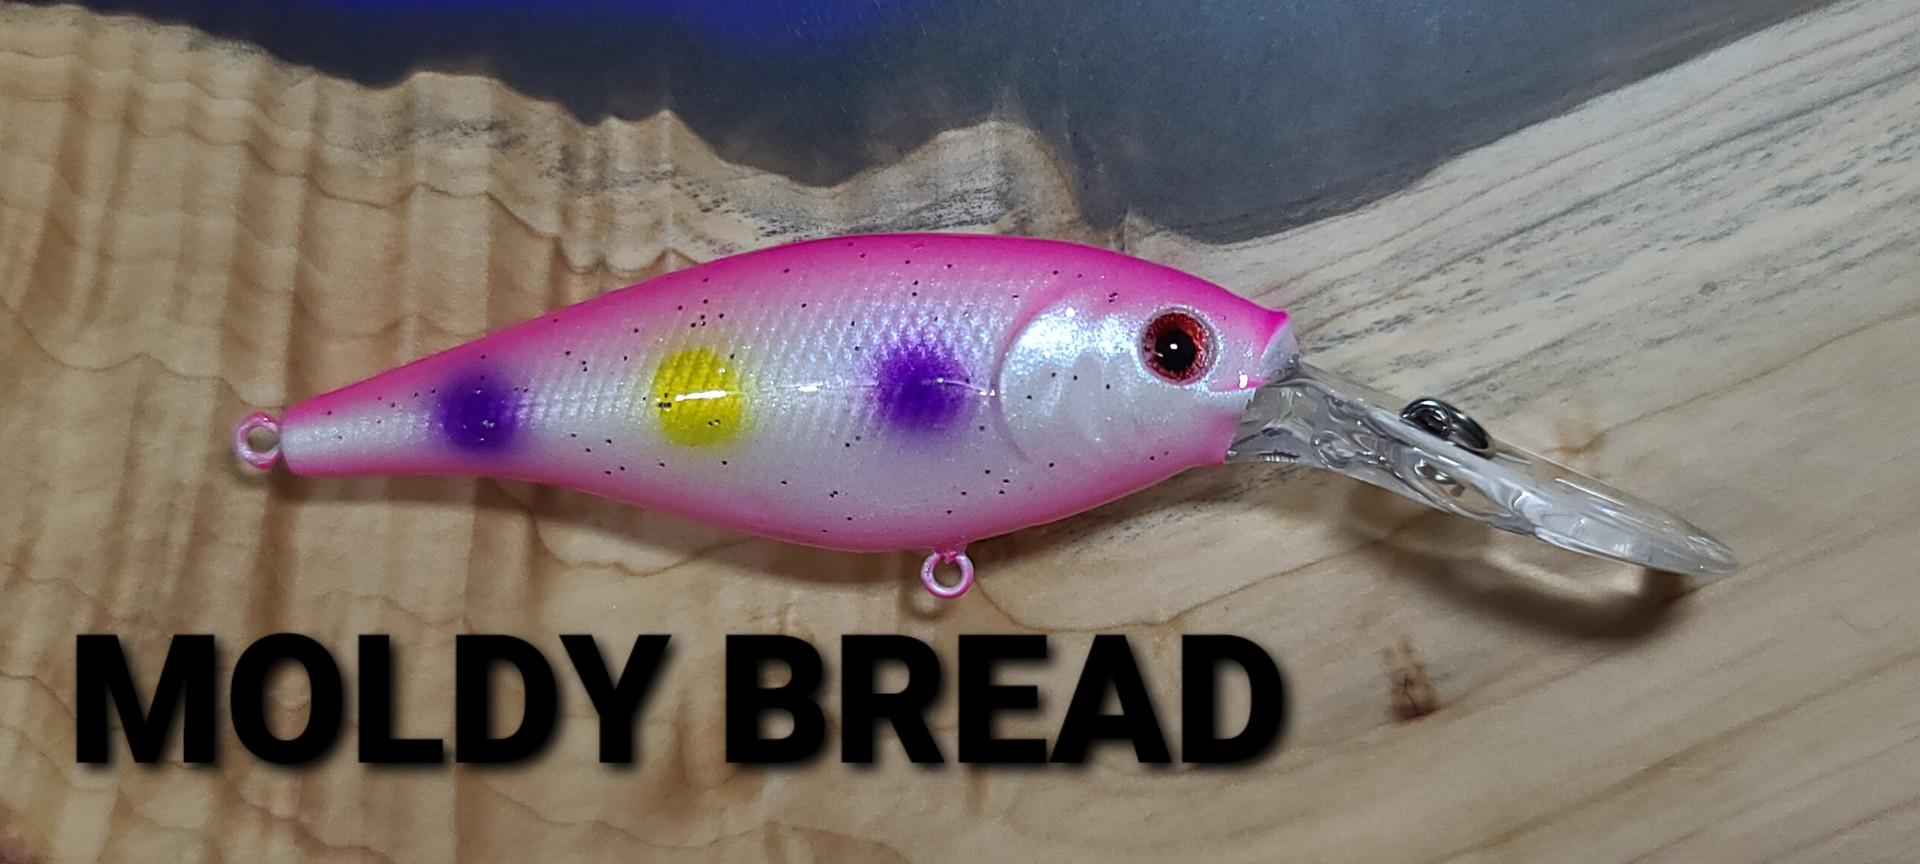 MOLDY BREAD.jpg